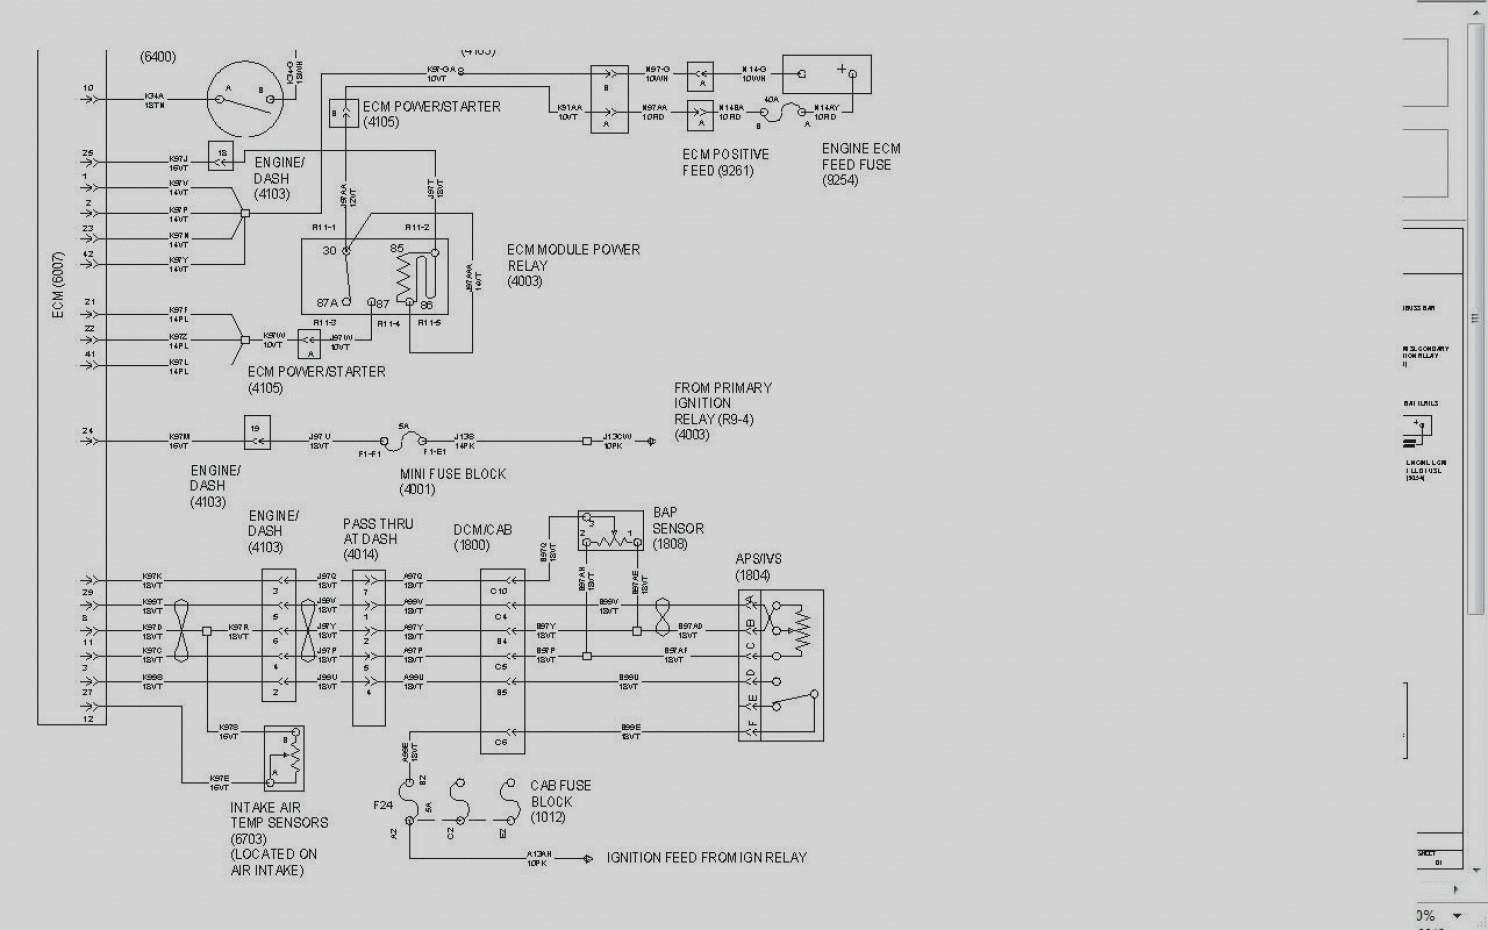 2002 Aprilia Rxv Fuse Box Car Wiring Diagram